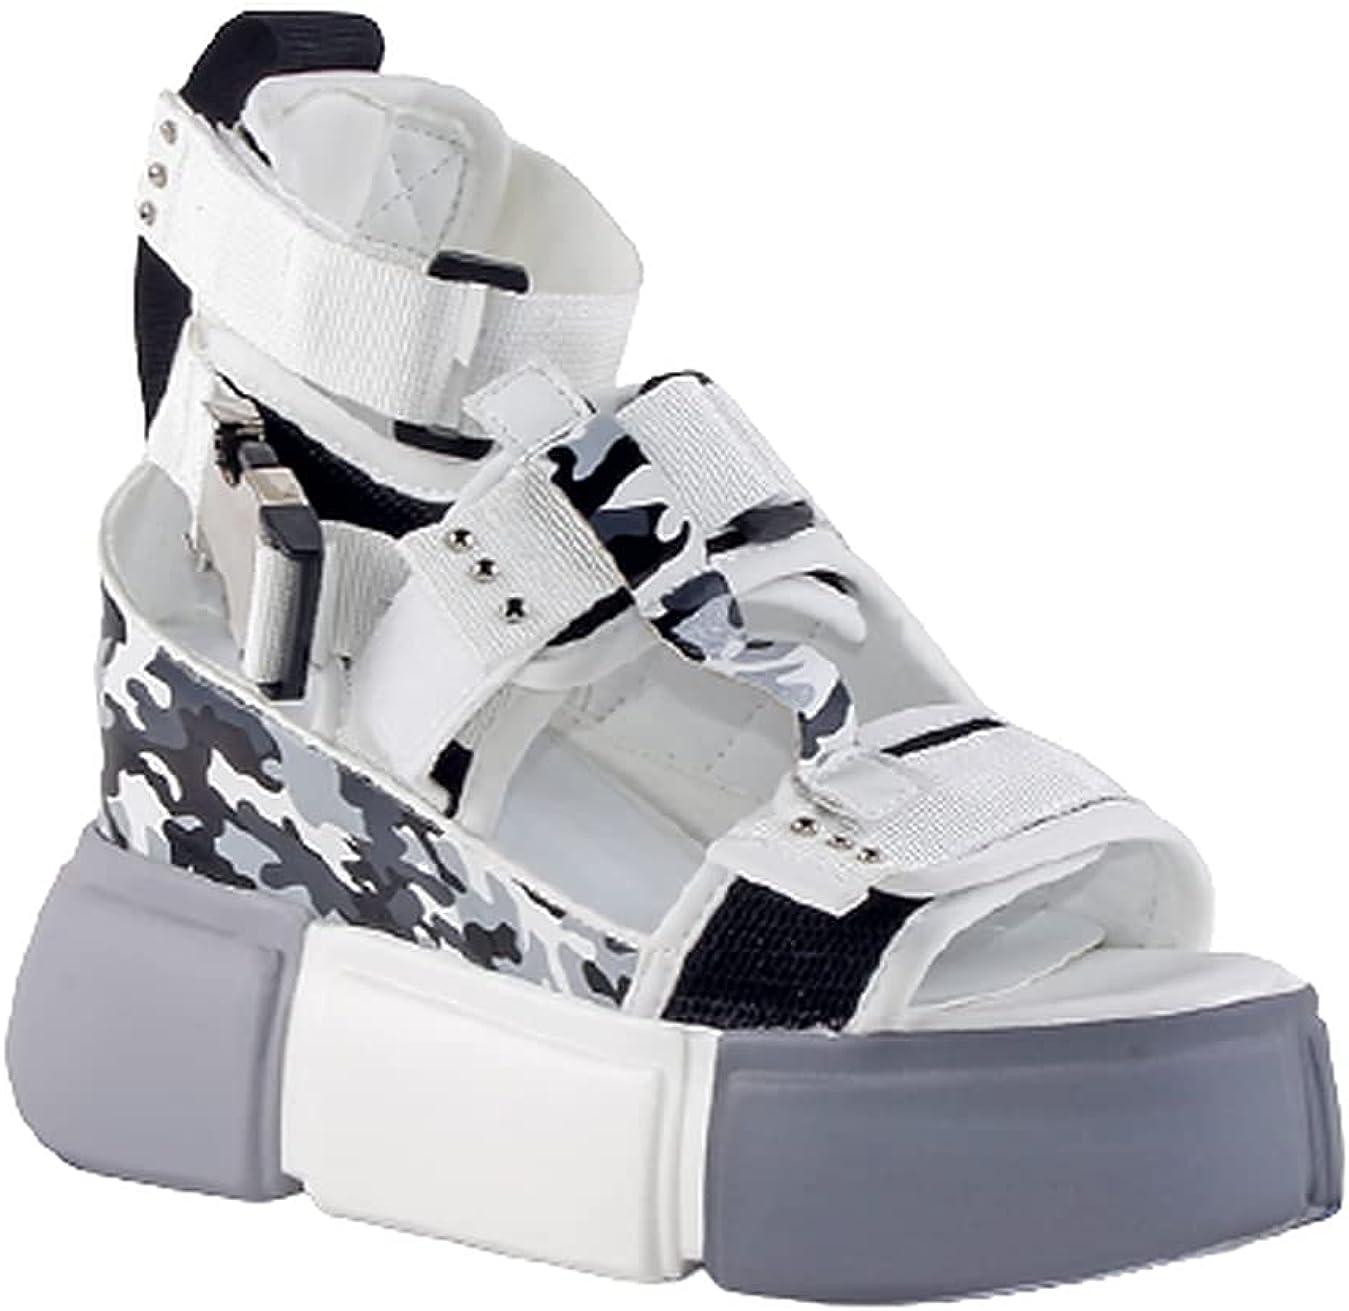 ANTHONY WANG Cranberry-07 White Camo Ret Toe Platform Wedge Latest item New product! New type Open